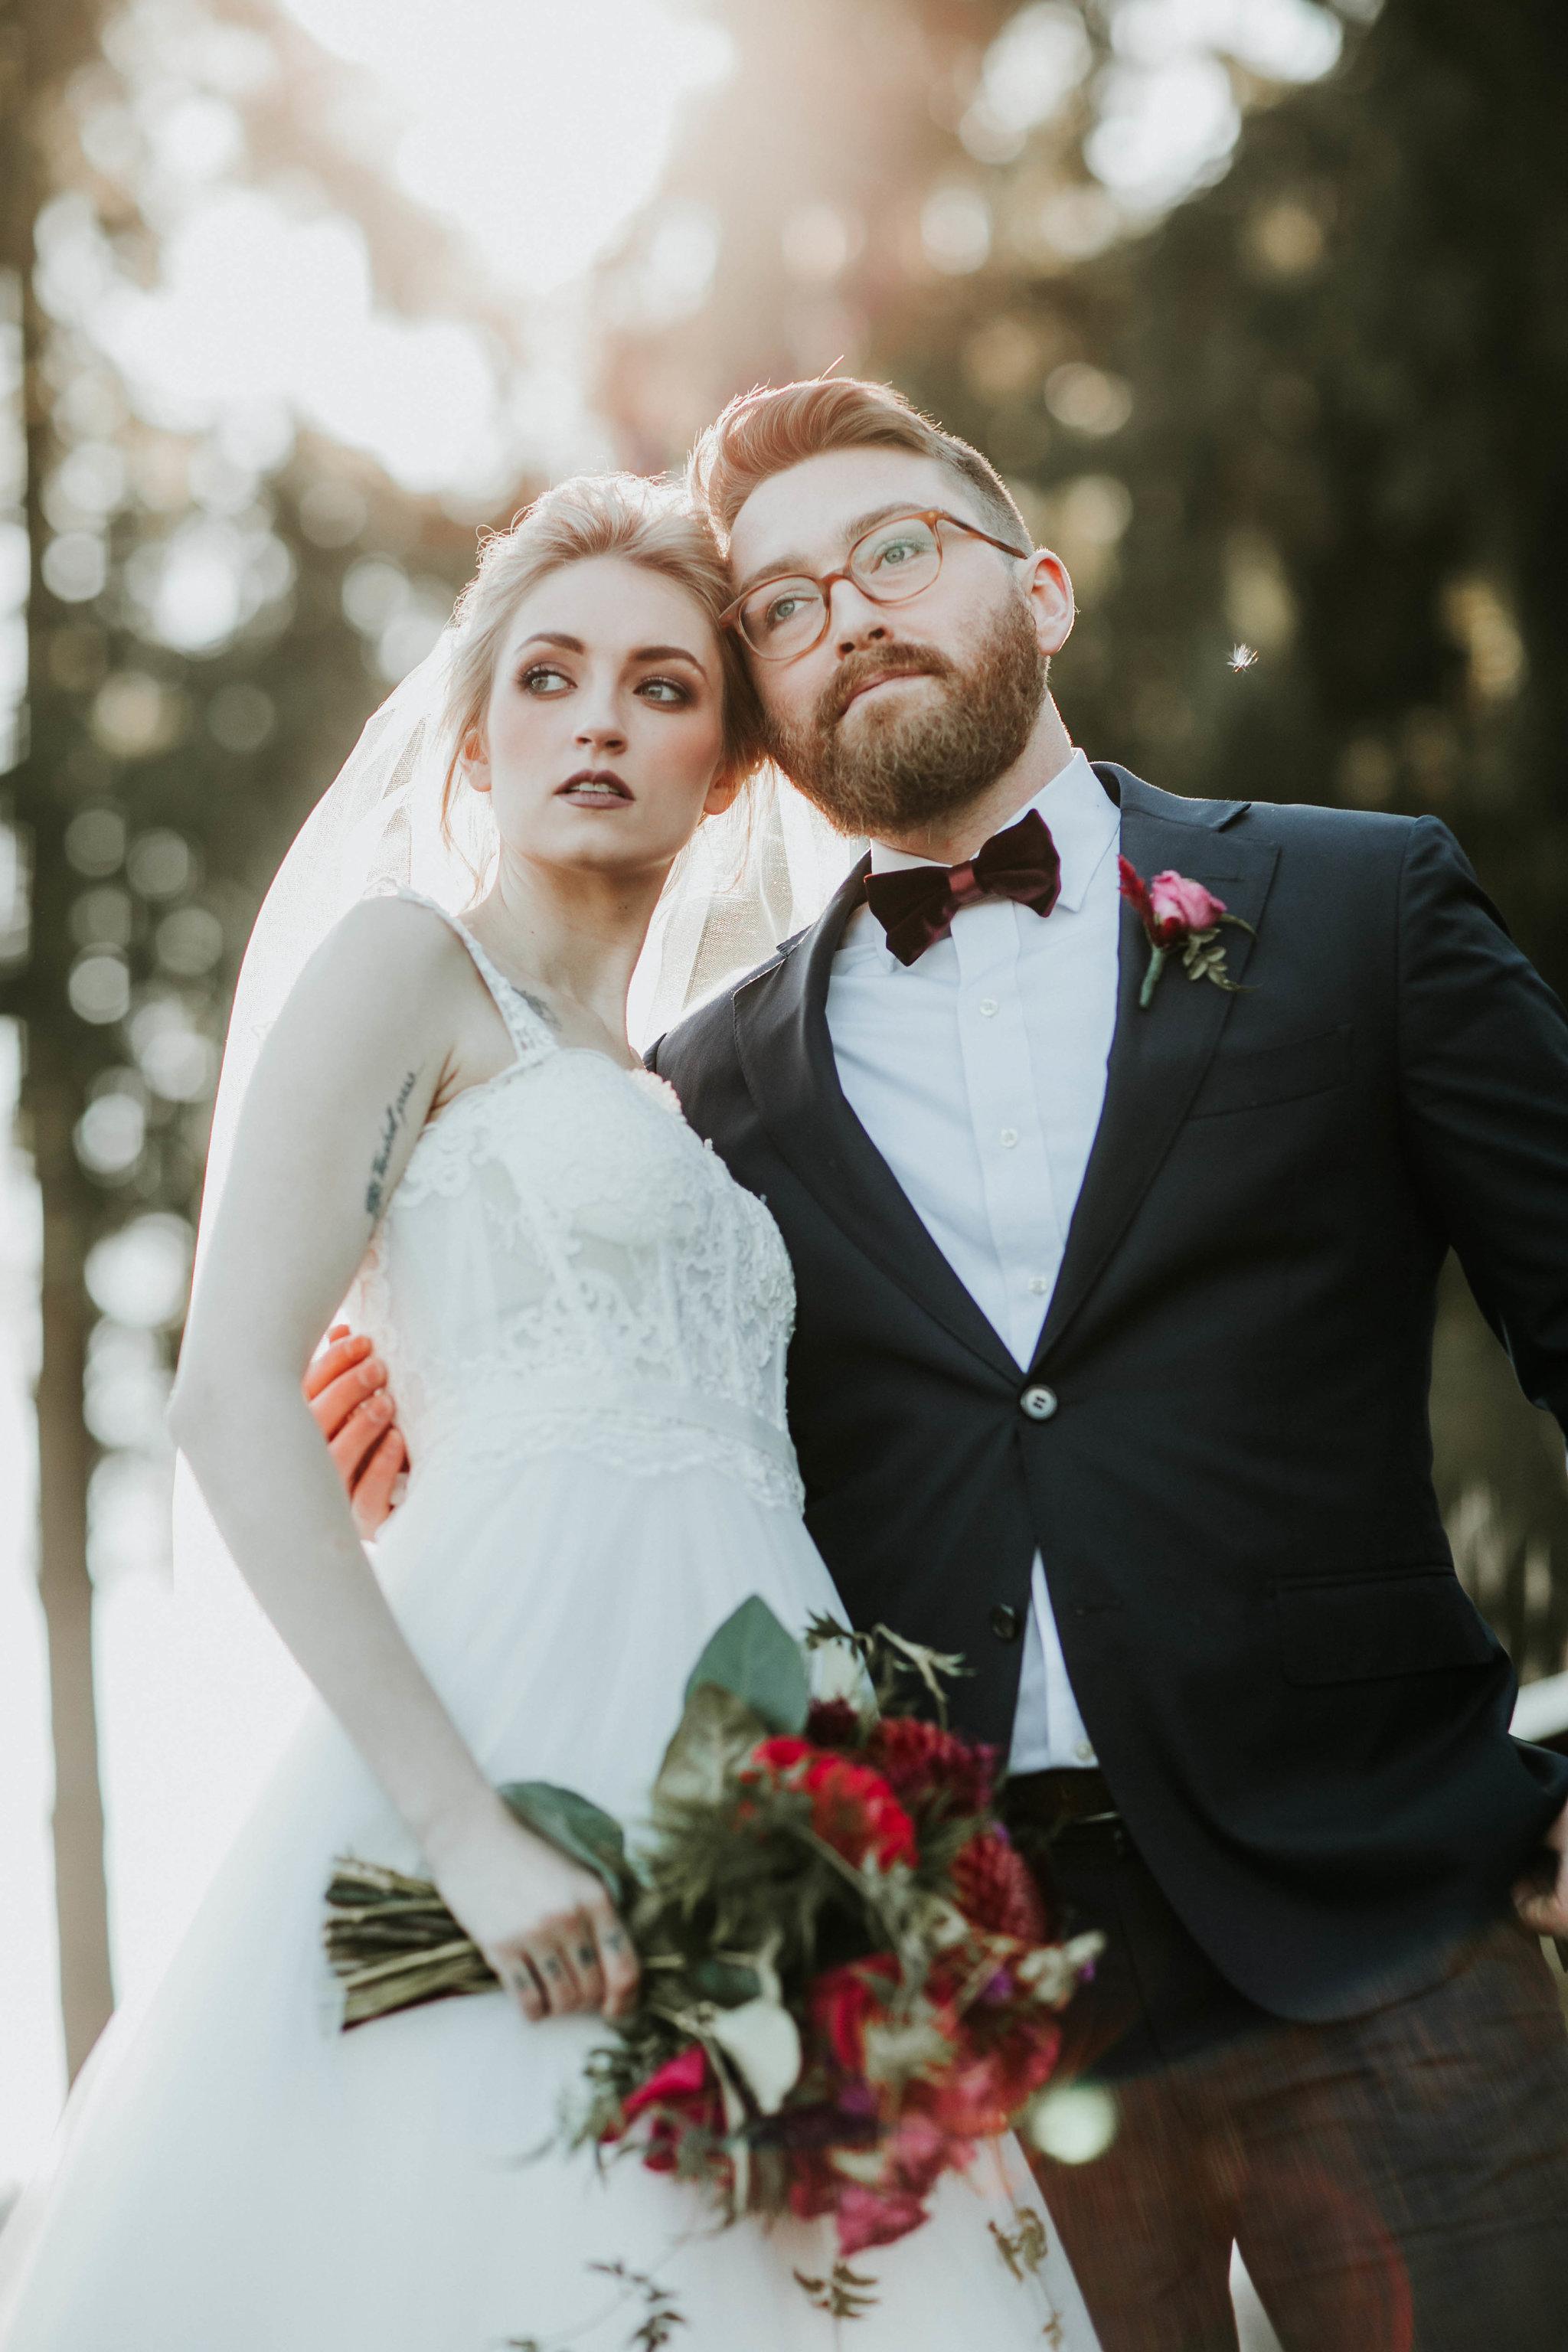 Crystal_Lake_lodge_Wedding_photos_by_Adina_Preston_Weddings_166.JPG